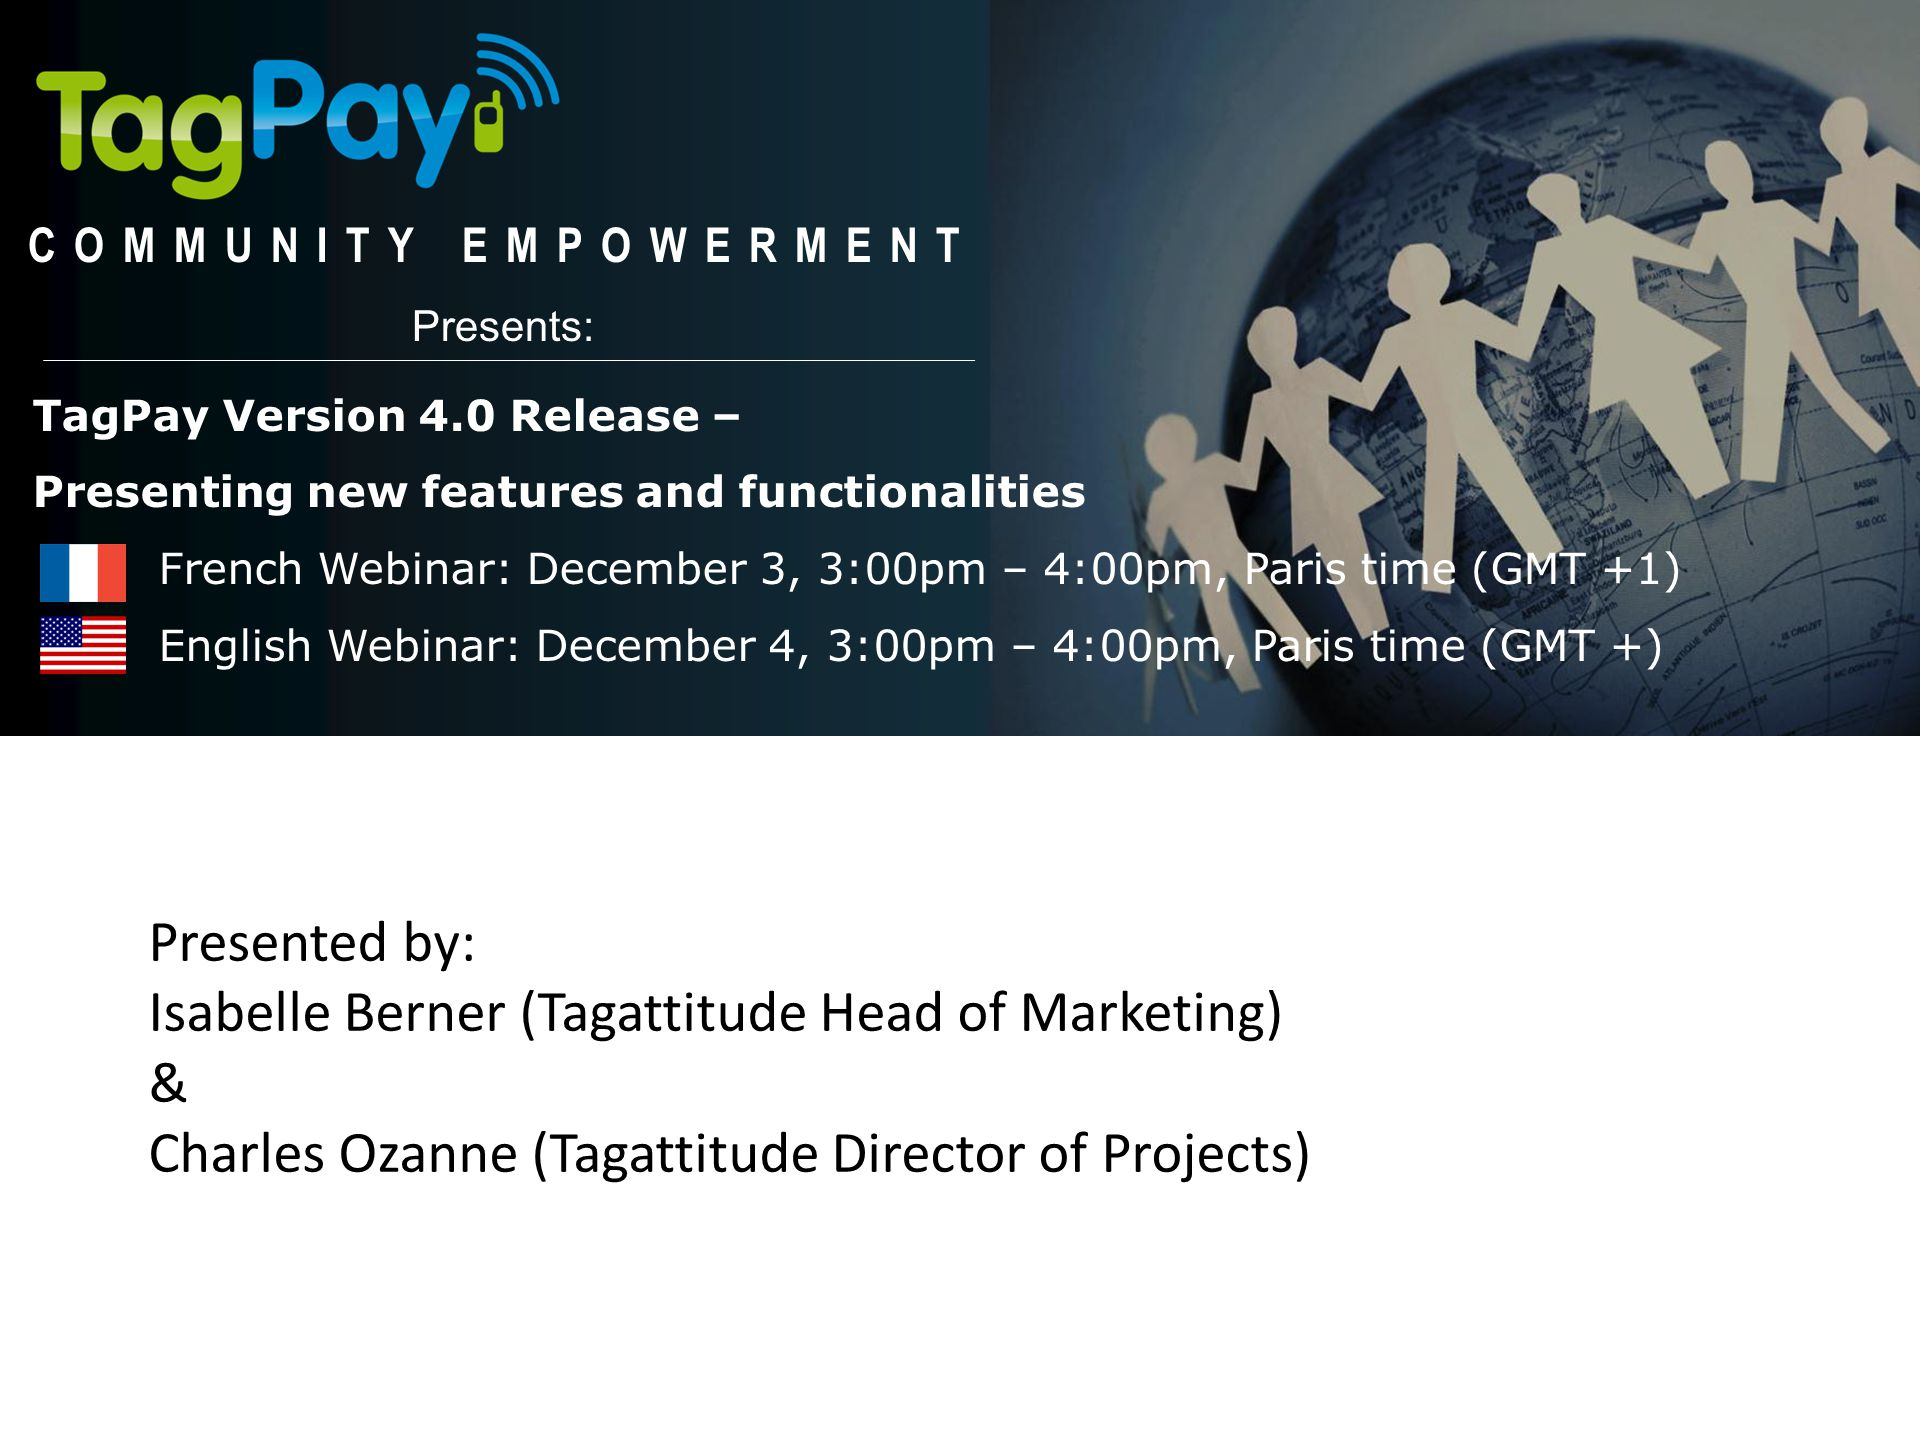 Isabelle Berner (Tagattitude Head of Marketing) &